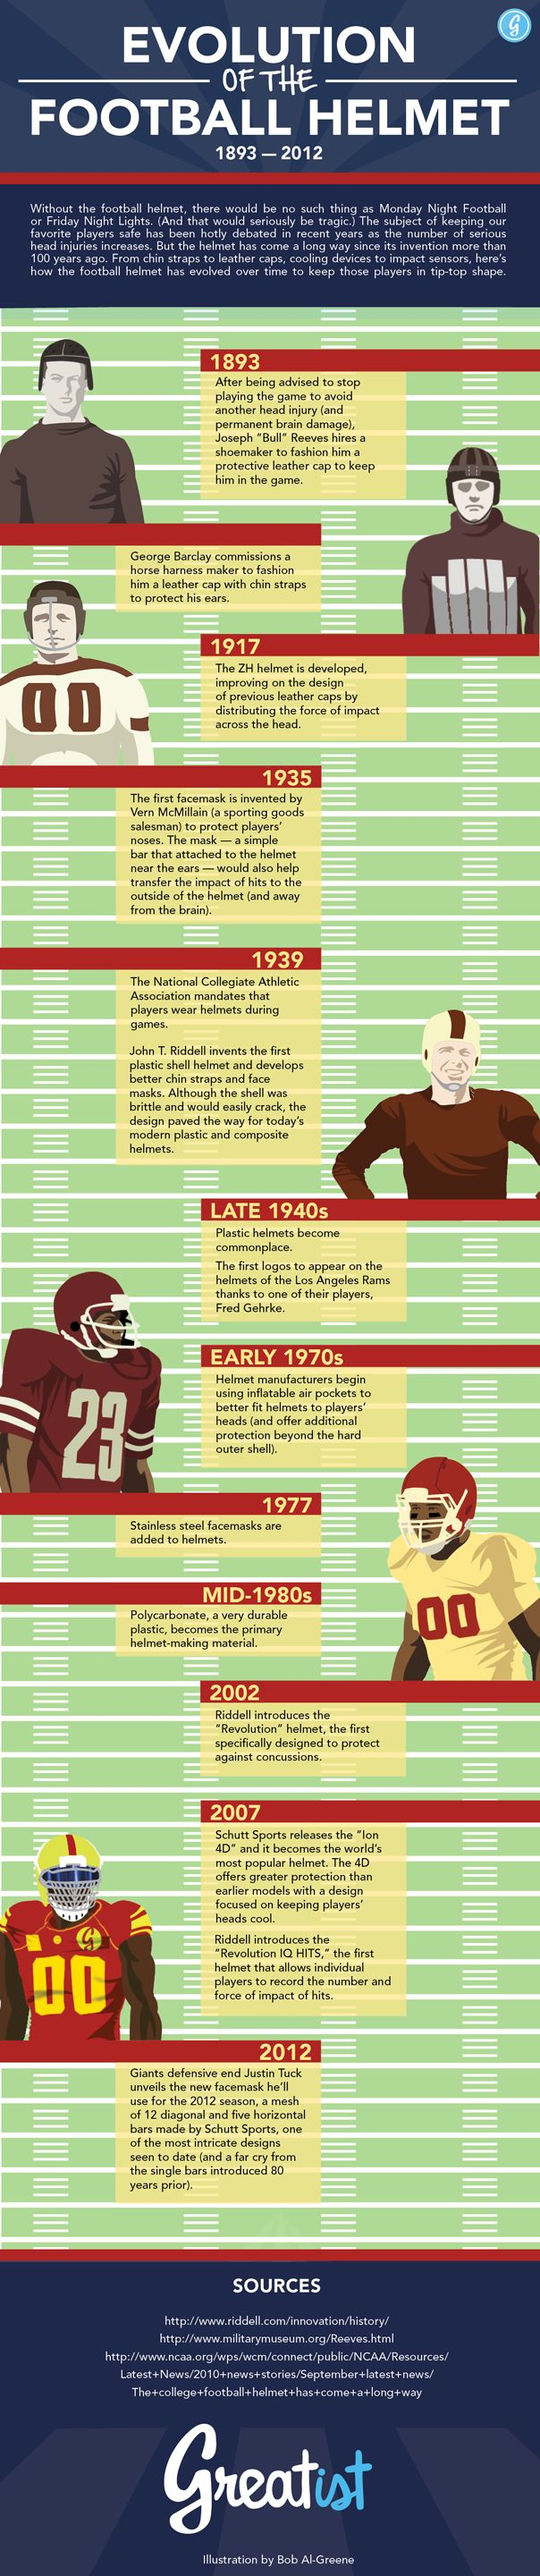 The Evolution of the Football Helmet [Infographic